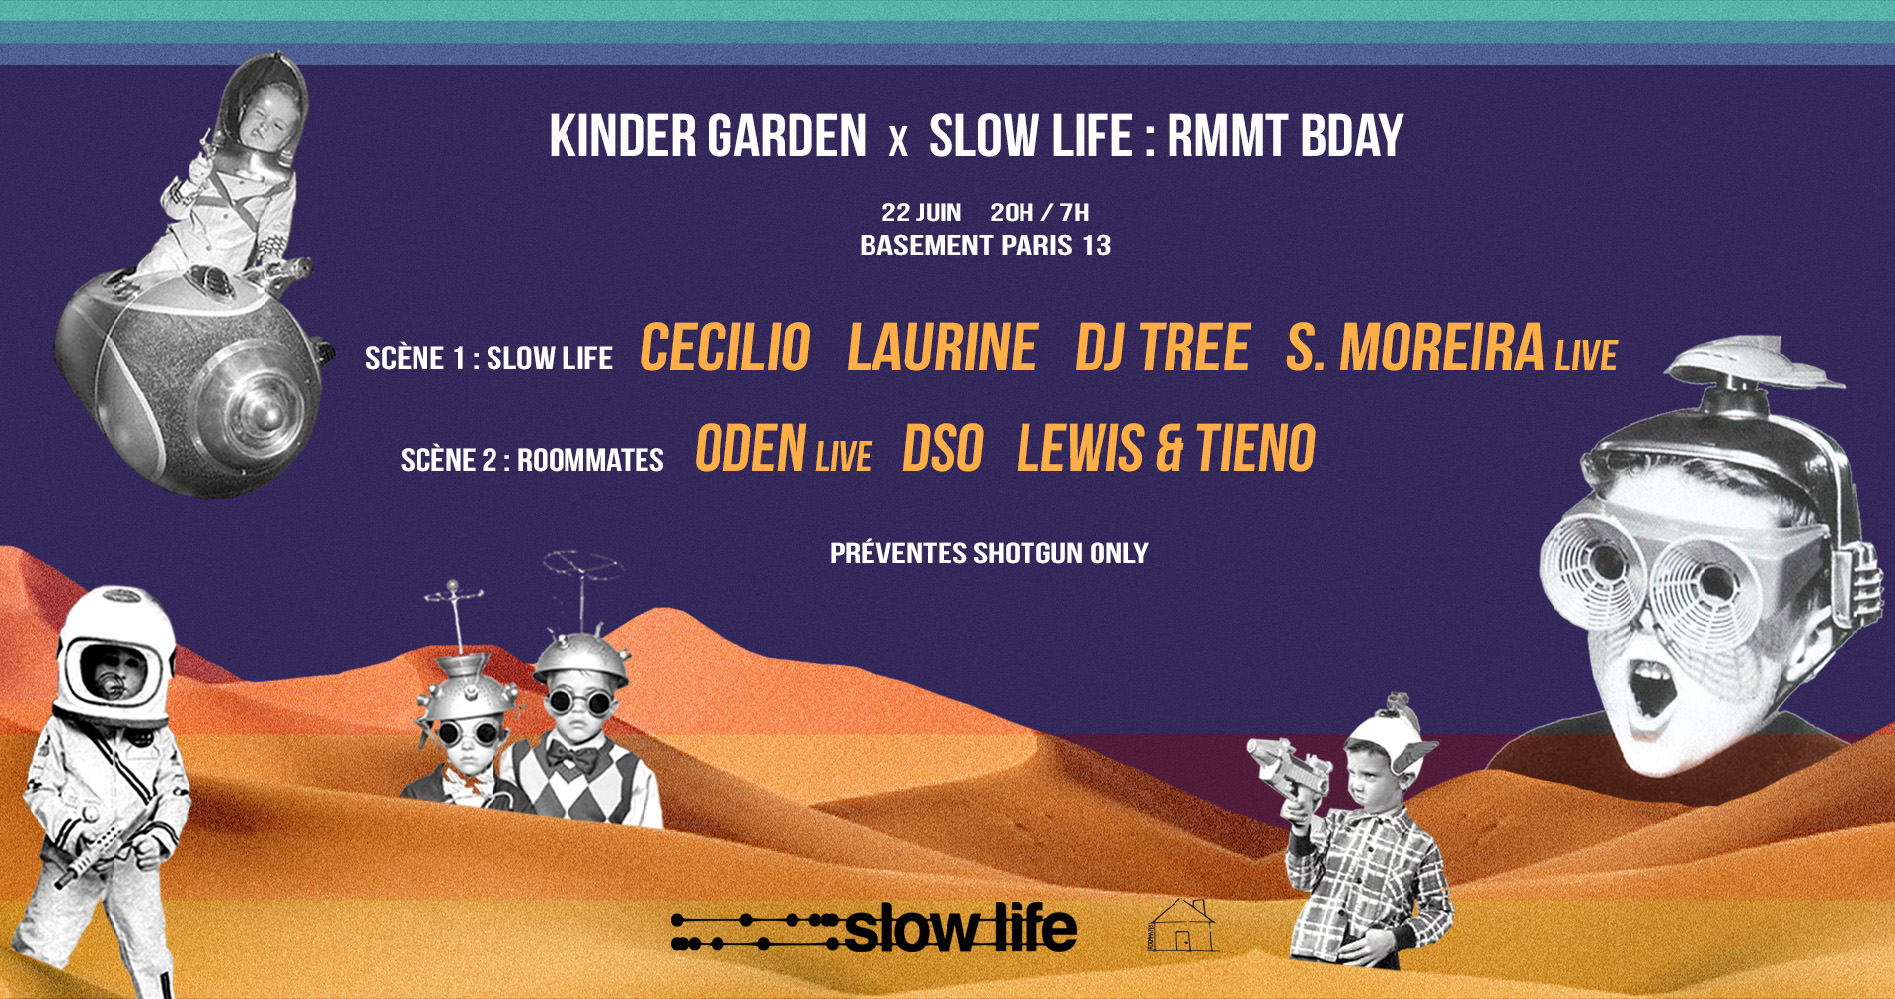 Kinder Garden x Slow Life ● Basement Paris 13